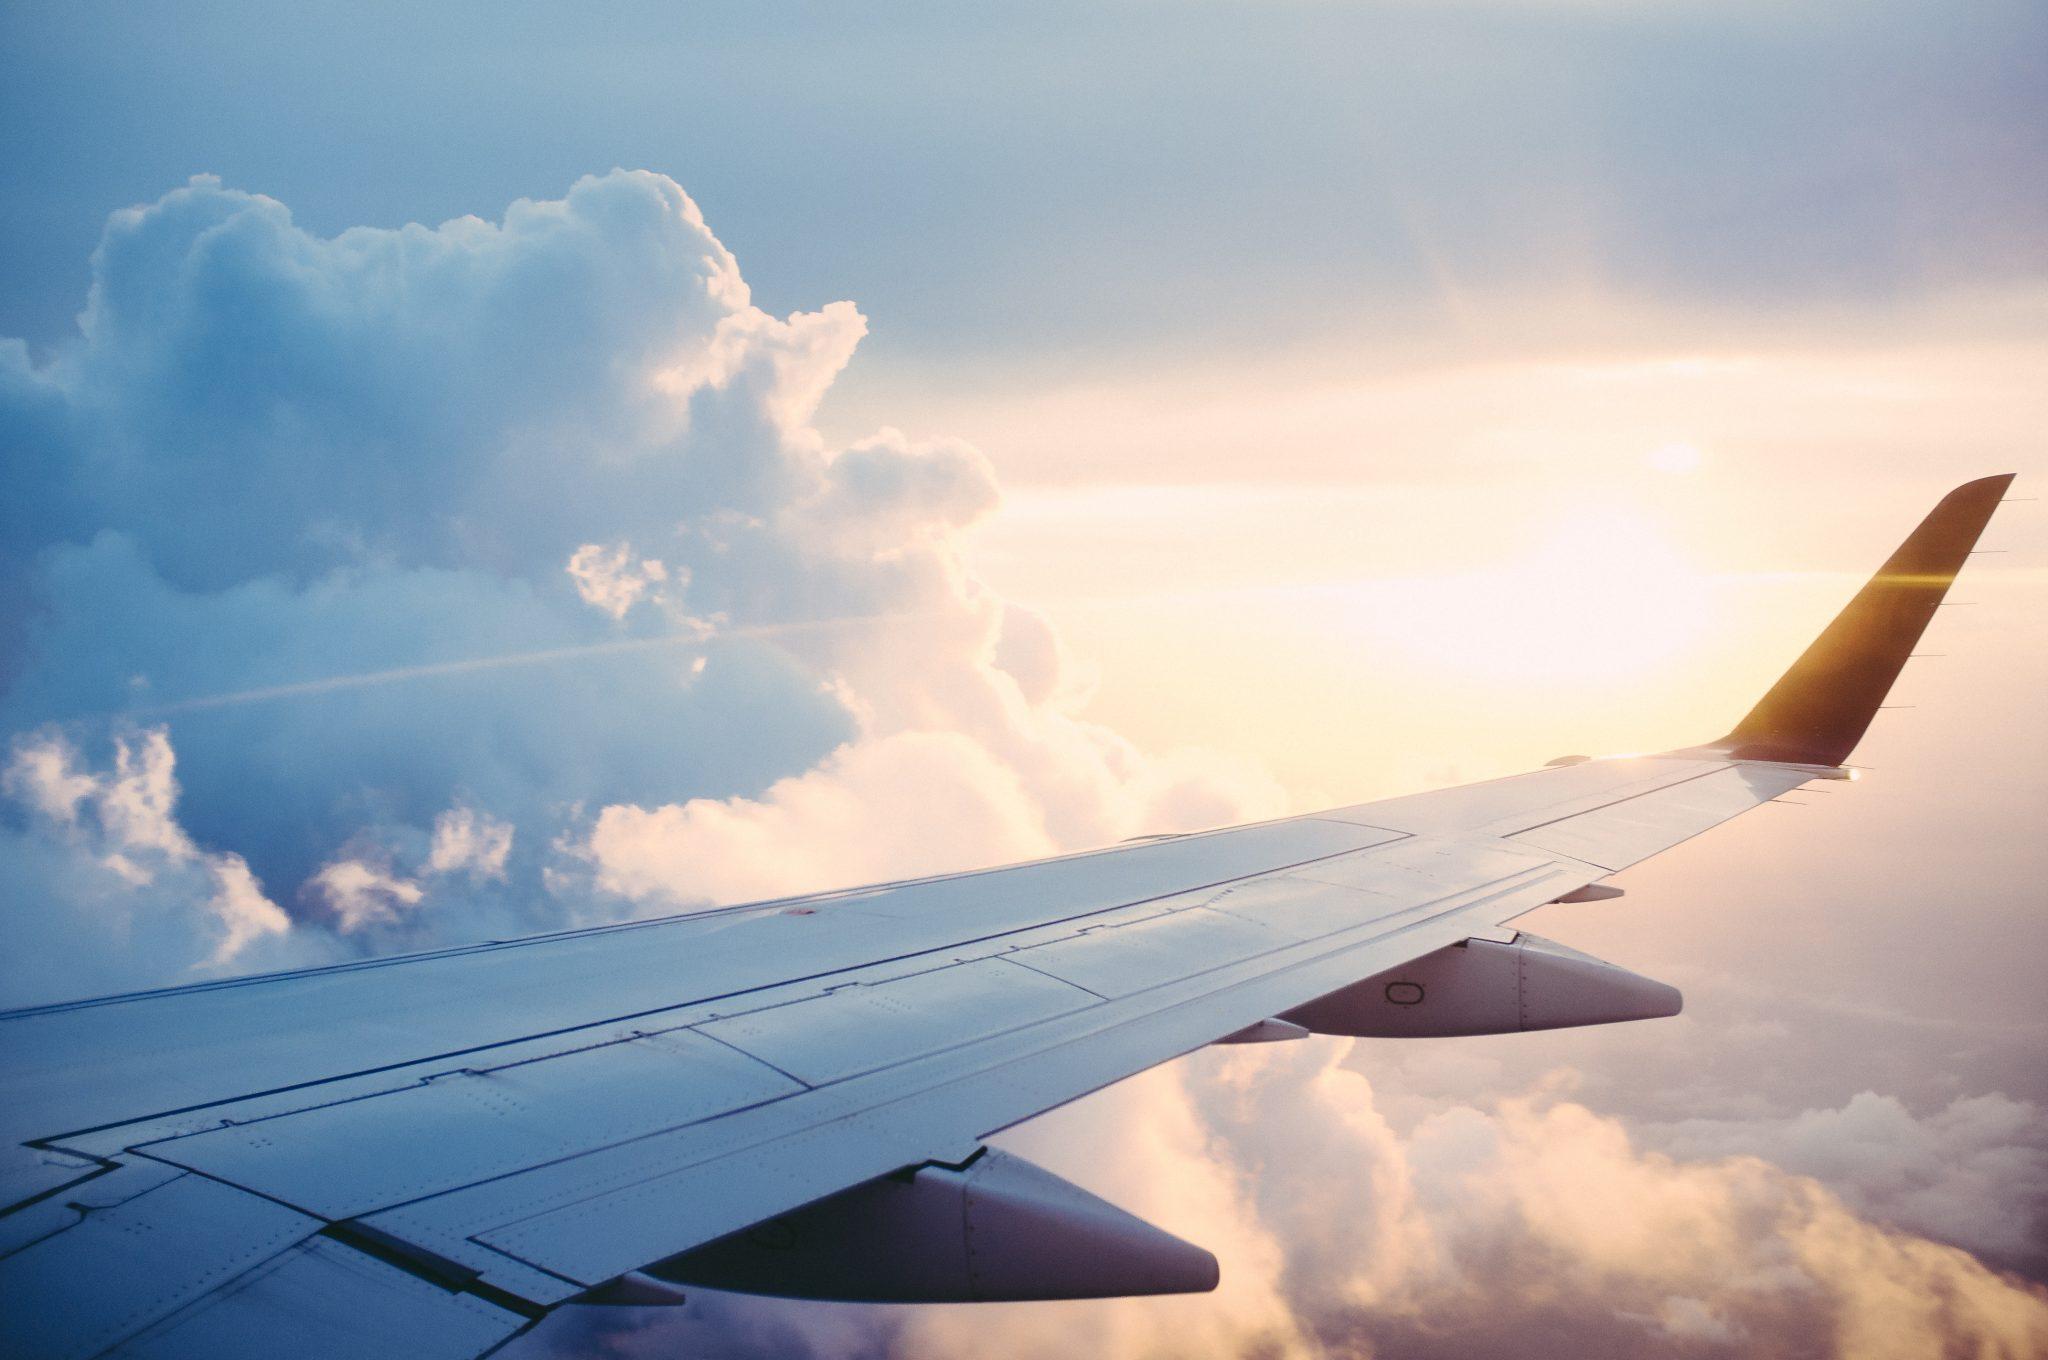 Tragfläche eines Flugzeugs am Himmel